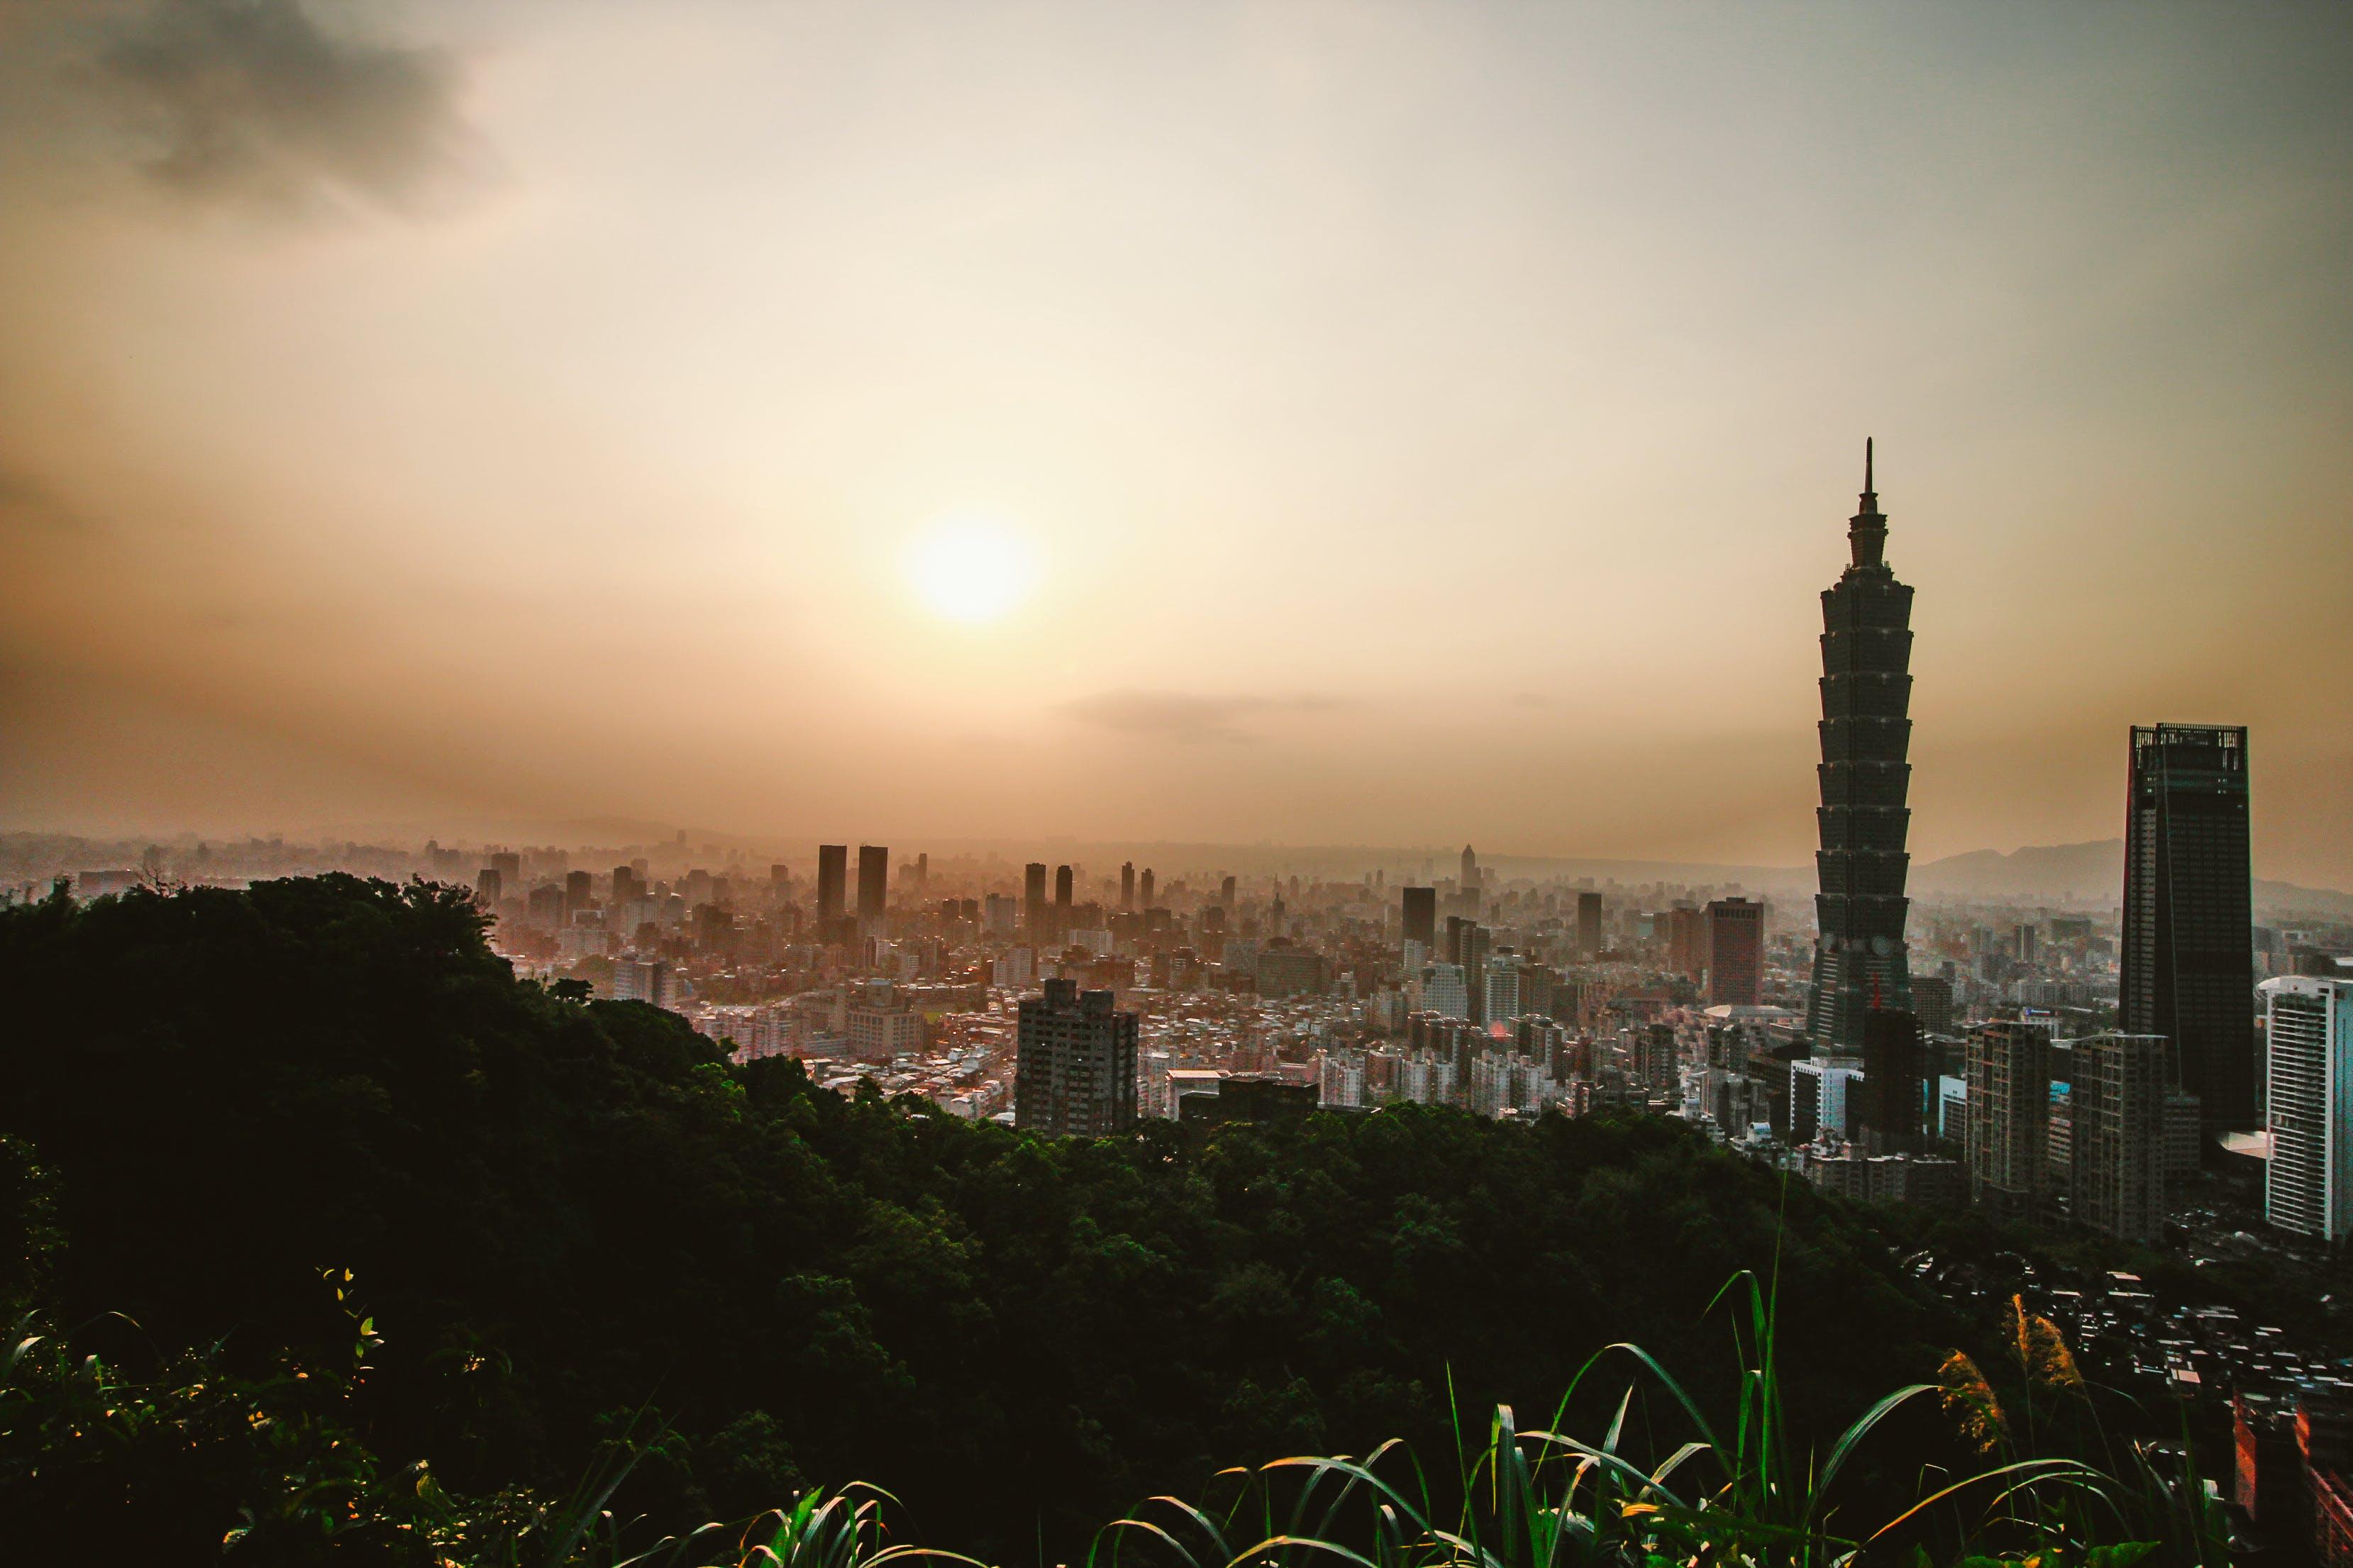 Kostenloses Stock Foto zu stadt, landschaft, himmel, sonnenuntergang